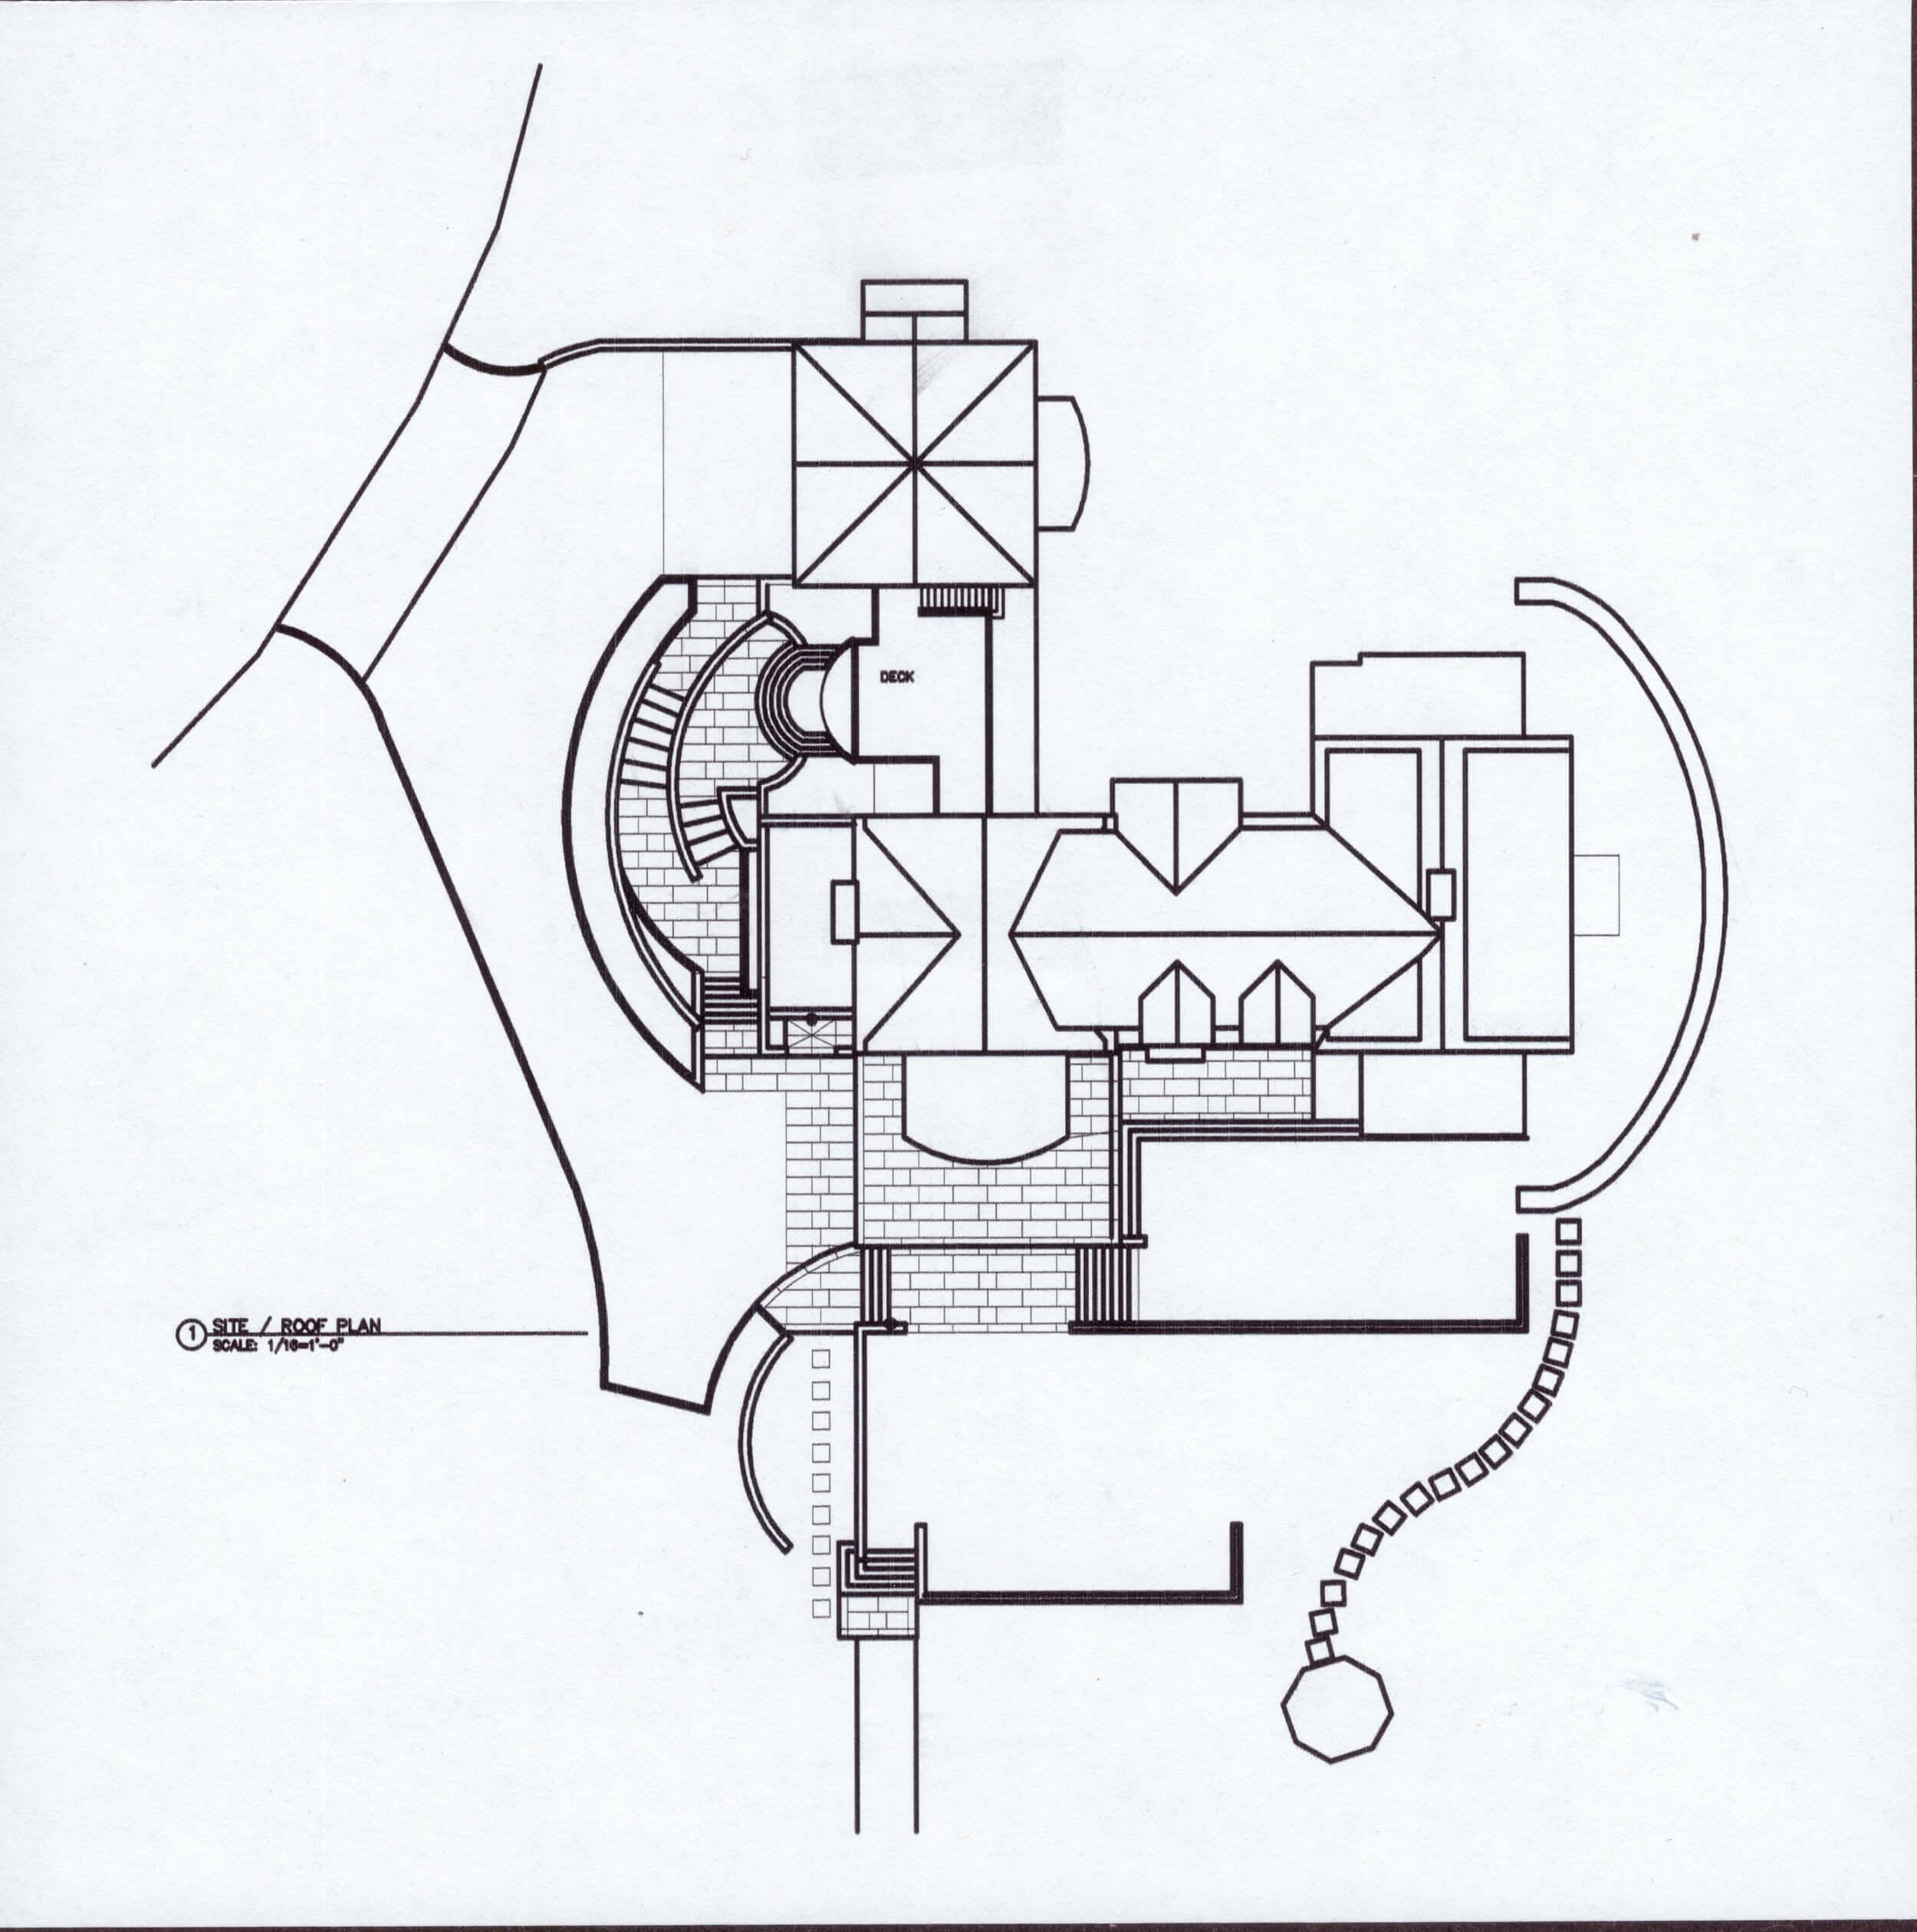 AHH_site_roof_plan.jpg